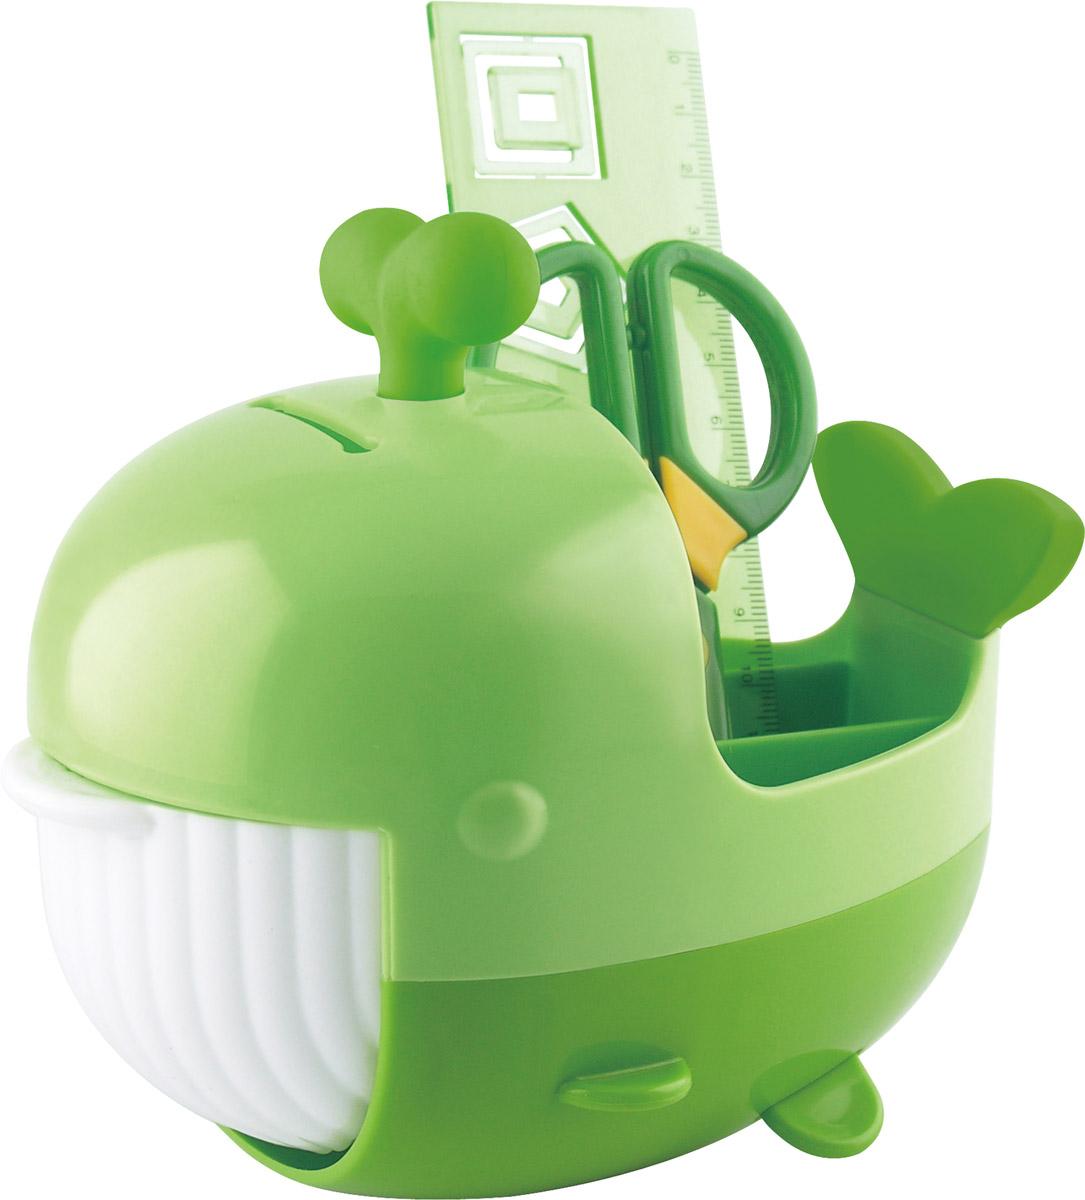 Brauberg Канцелярский набор Кит цвет зеленый 4 предмета